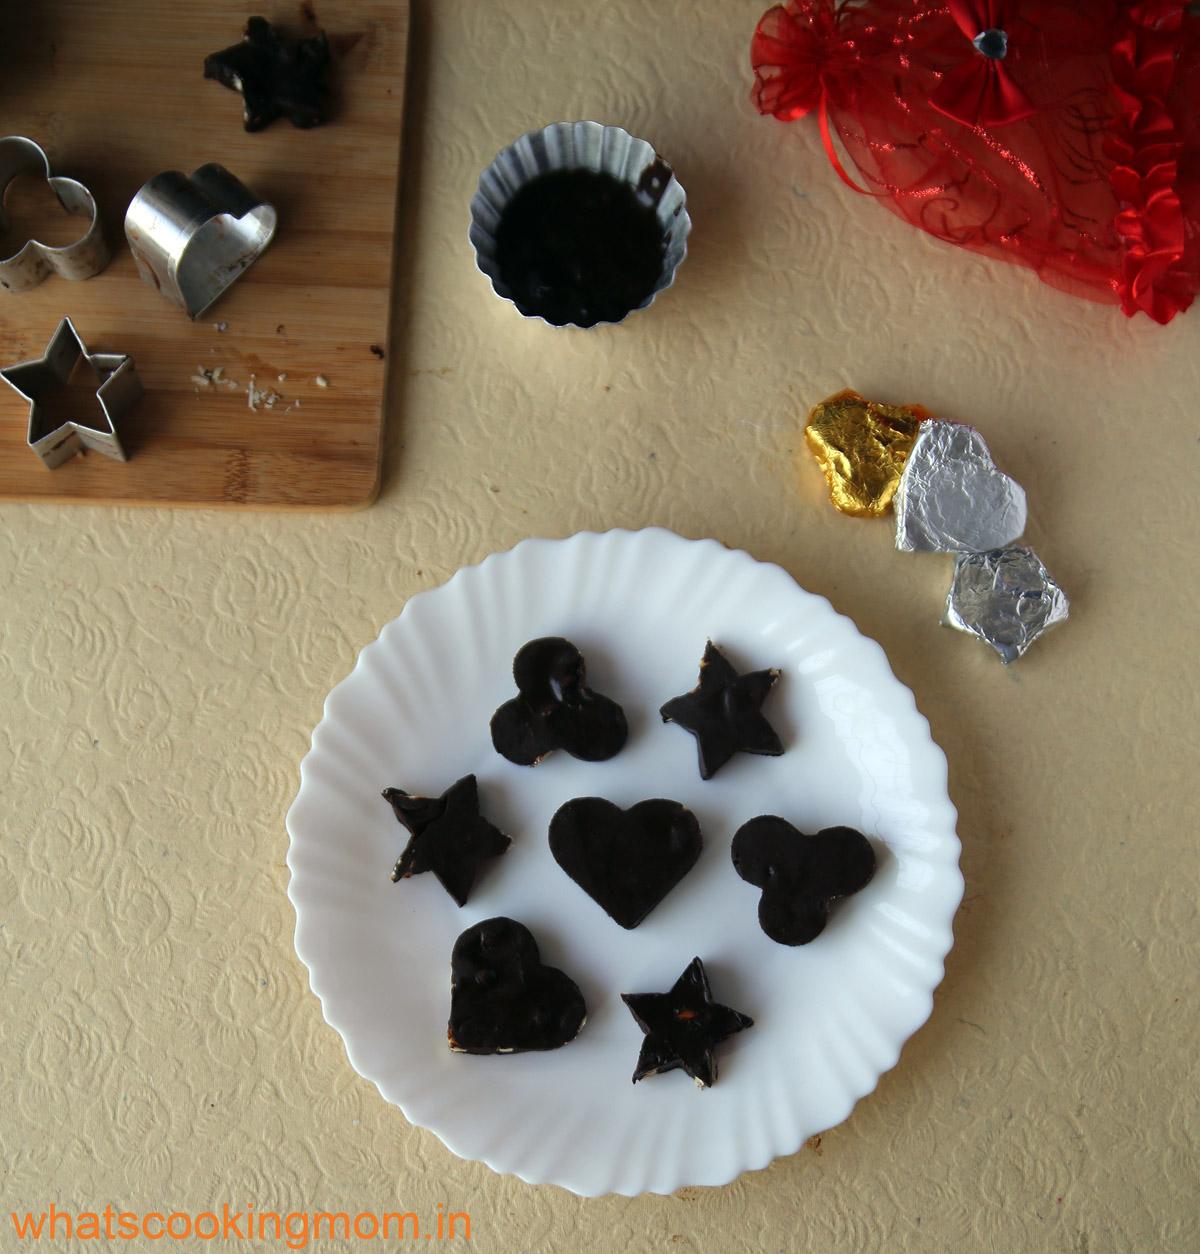 Homemade chocolates - easy recipe, #homemade #chocolate #nobakesweets